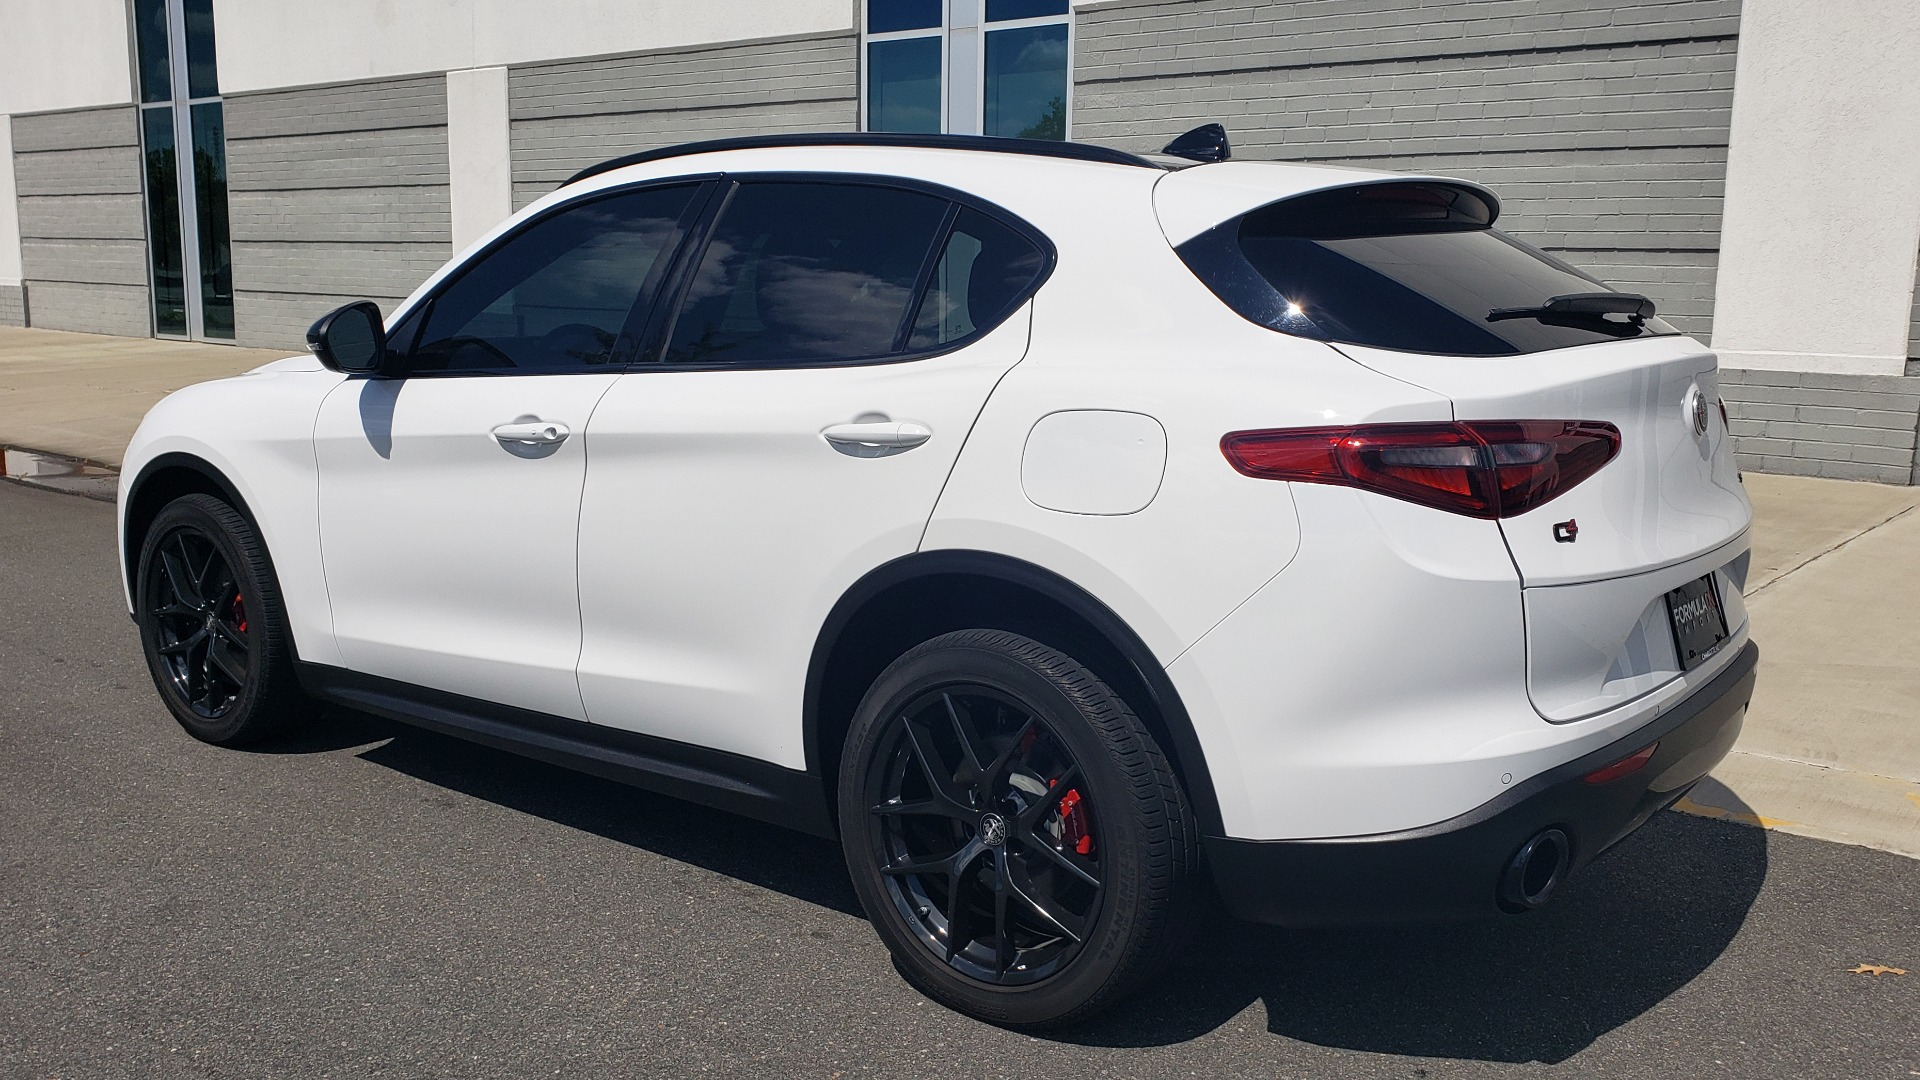 Used 2019 Alfa Romeo STELVIO TI SPORT AWD / 2.0L TURBO / 8-SPD AUTO / DRVR ASST / REARVIEW for sale $37,495 at Formula Imports in Charlotte NC 28227 10